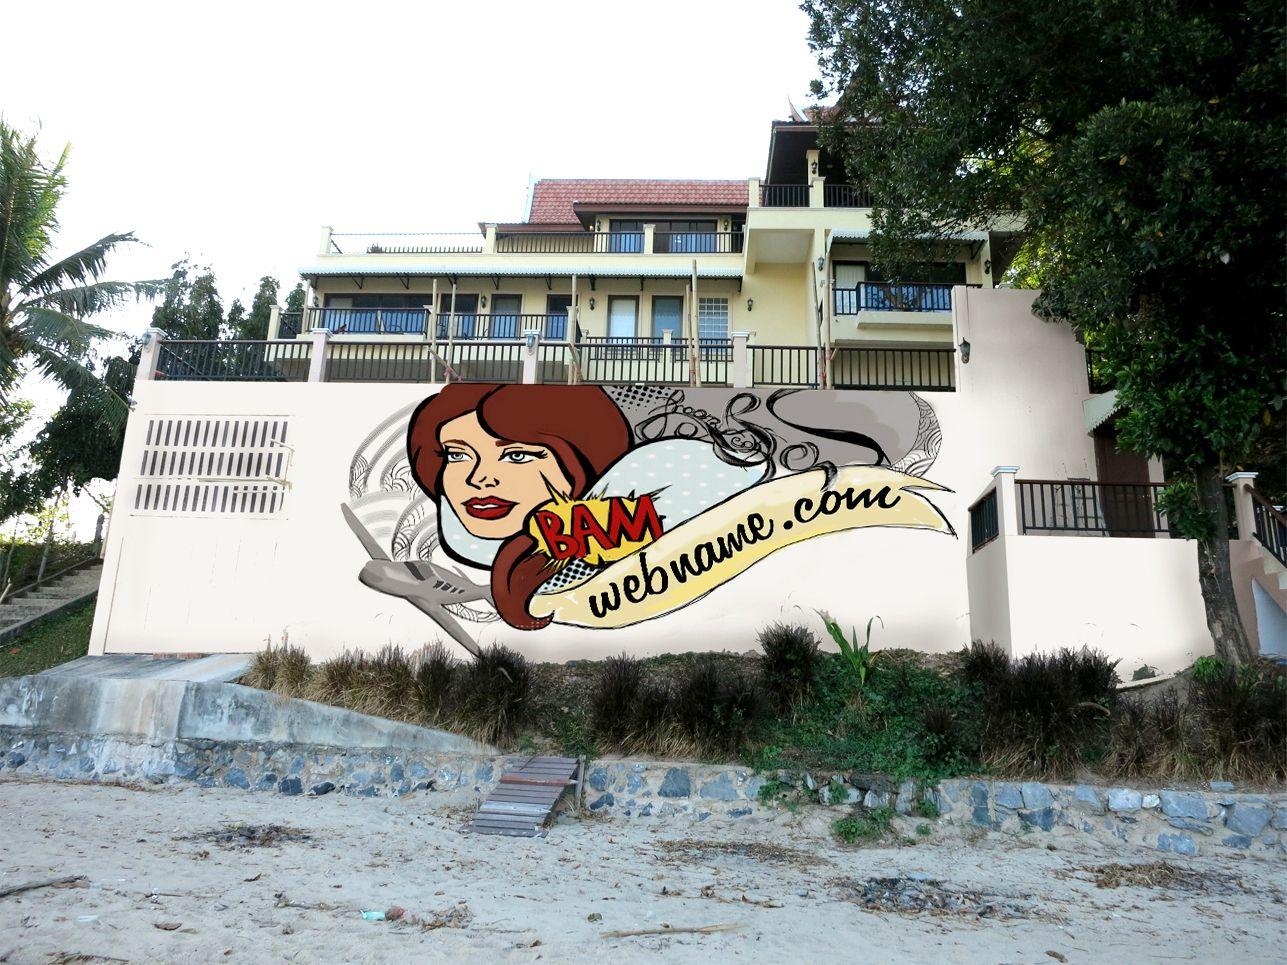 Эскиз для росписи стены - дизайнер Zhukova_Kseniya